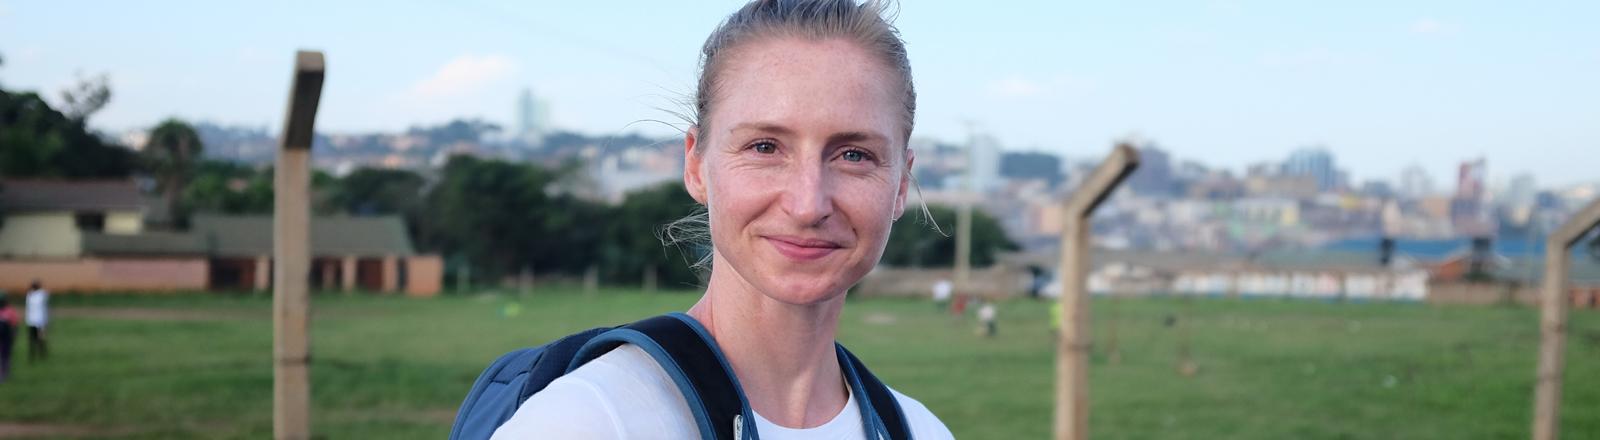 Hanna Berger mit Rucksack in Uganda